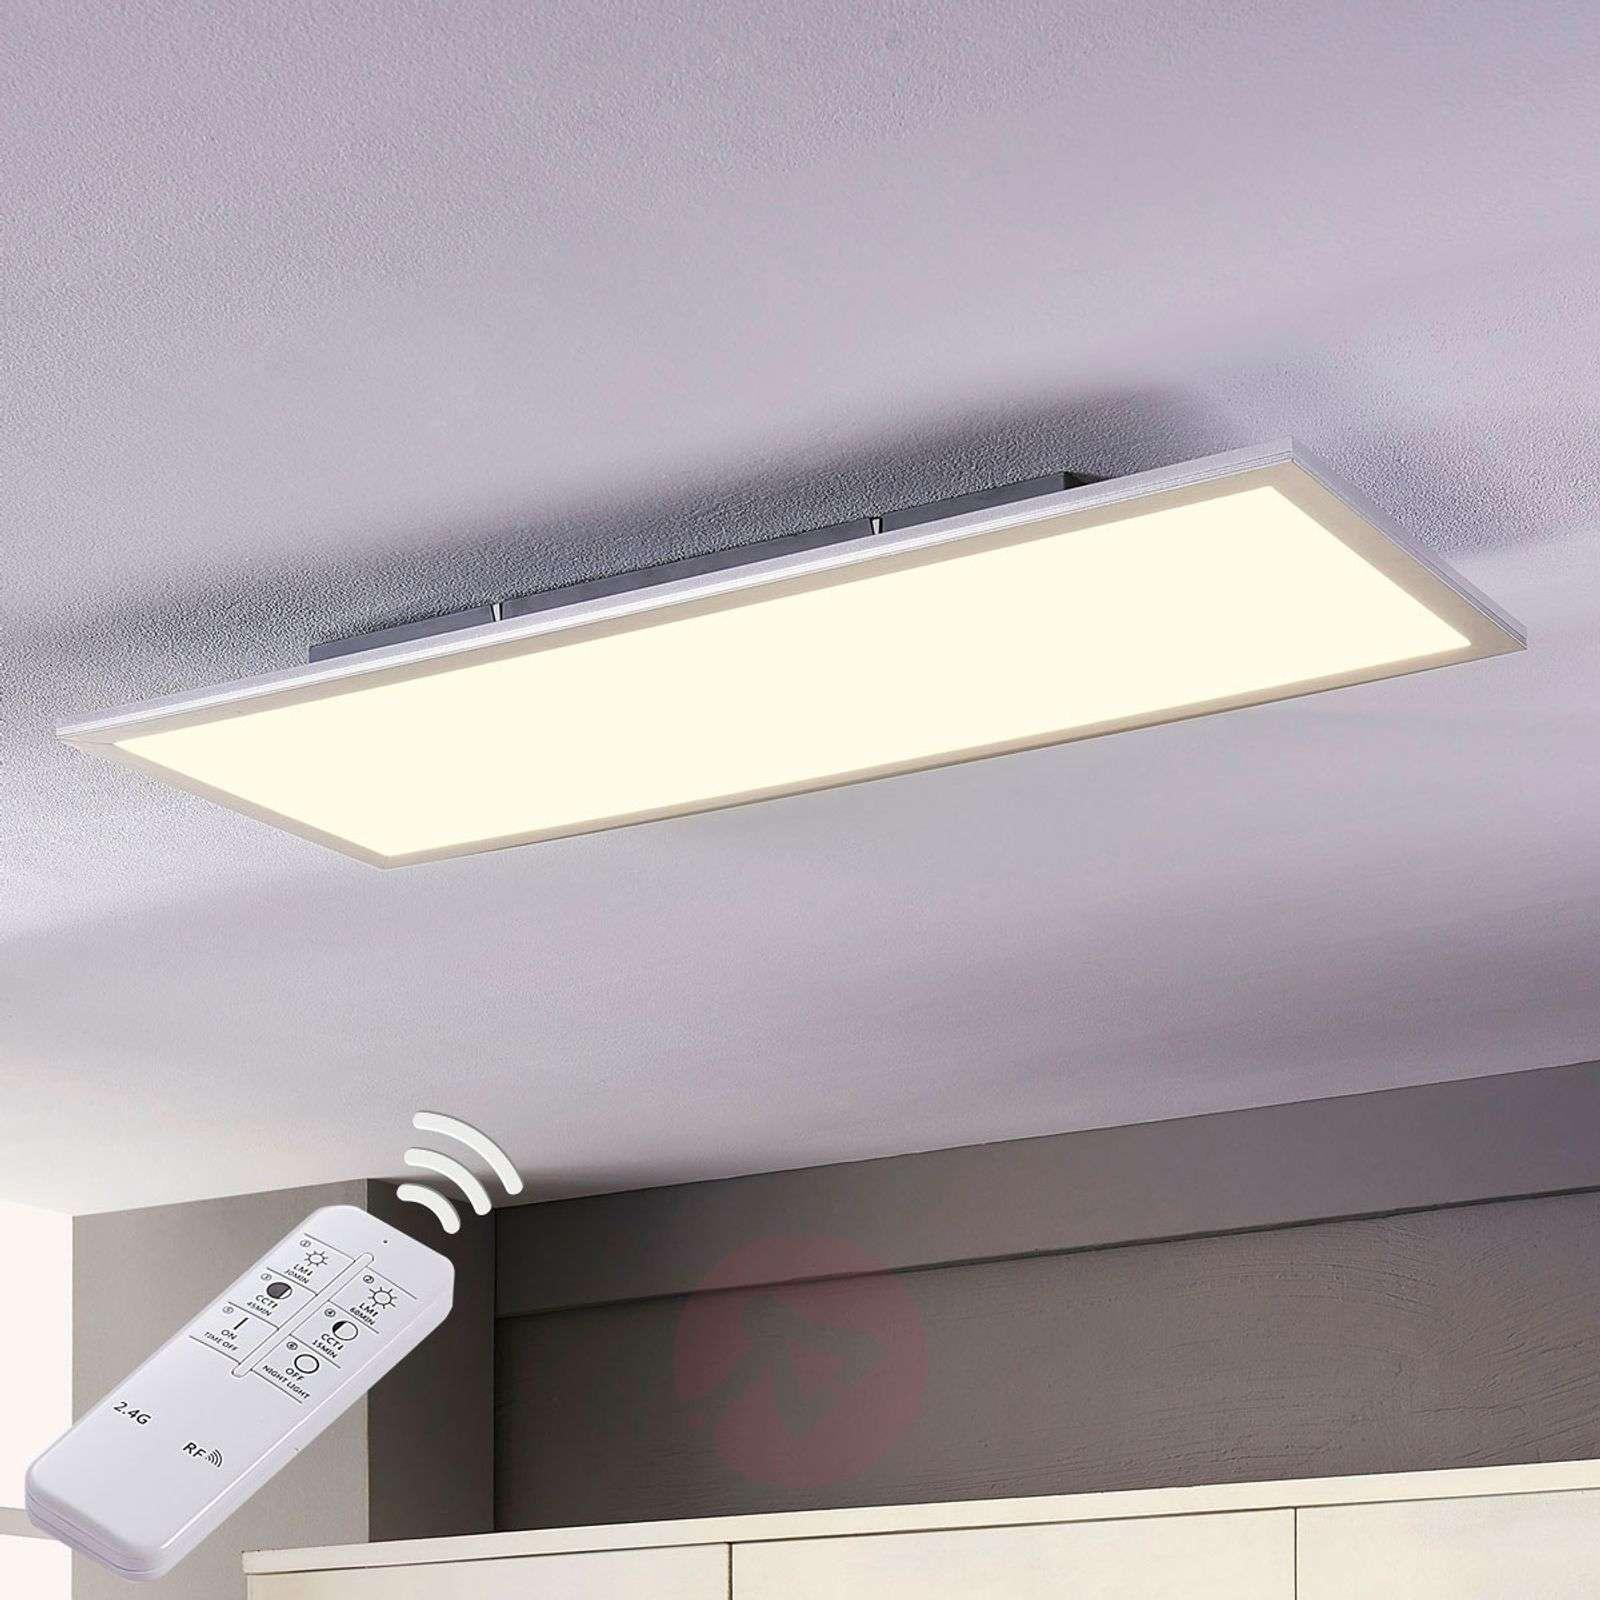 Vaihdettava valon väri – LED-kattovalaisin Livel